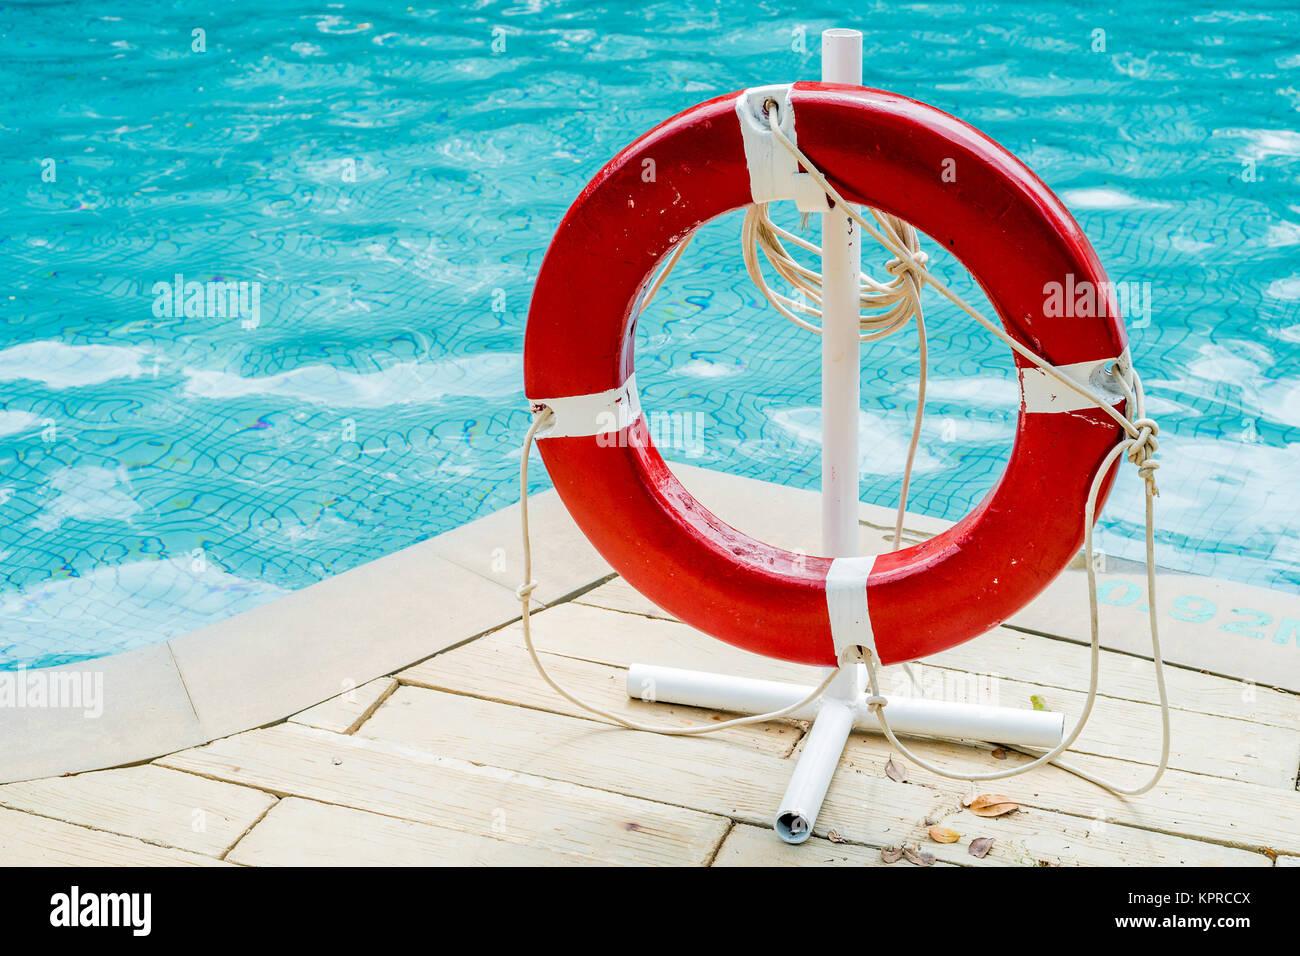 Pool Lifeguard Rescue Stock Photos Pool Lifeguard Rescue Stock Images Alamy